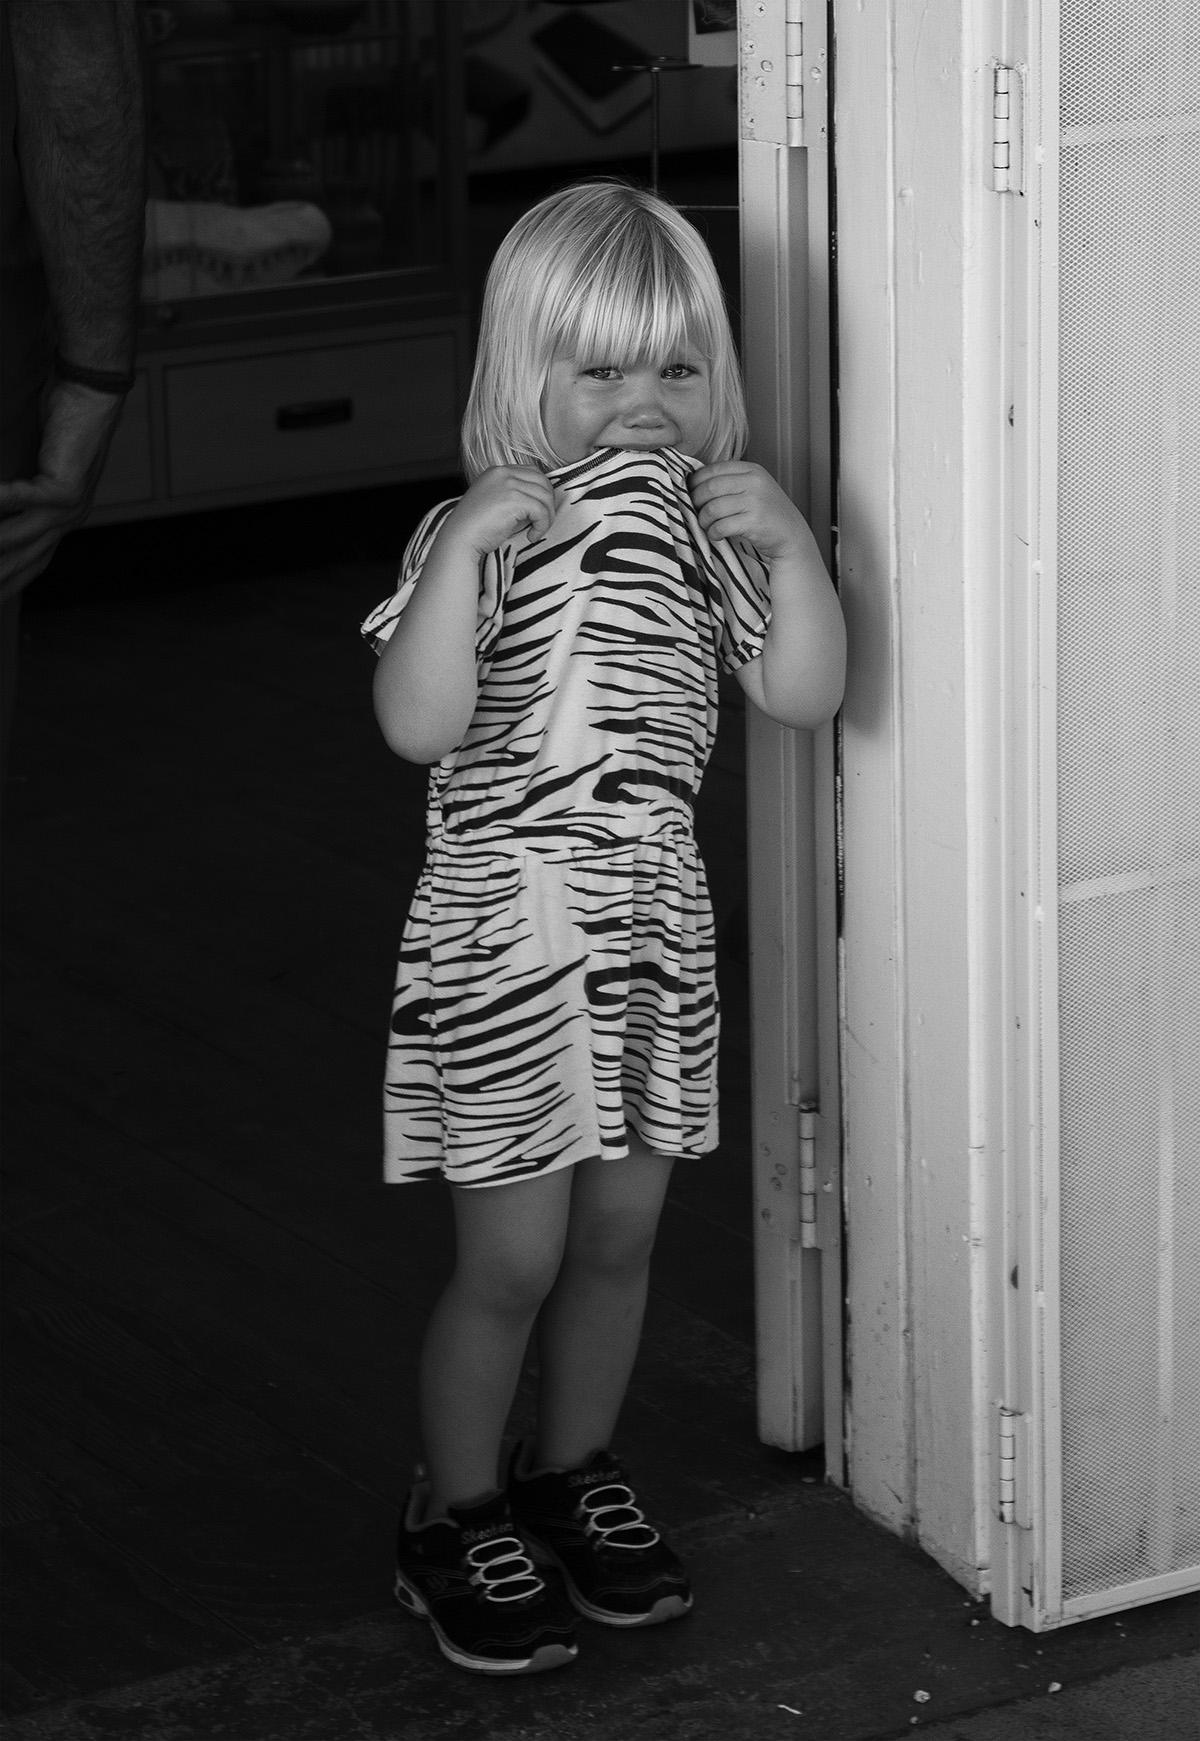 girl at Everglades. Florida, USA 2012